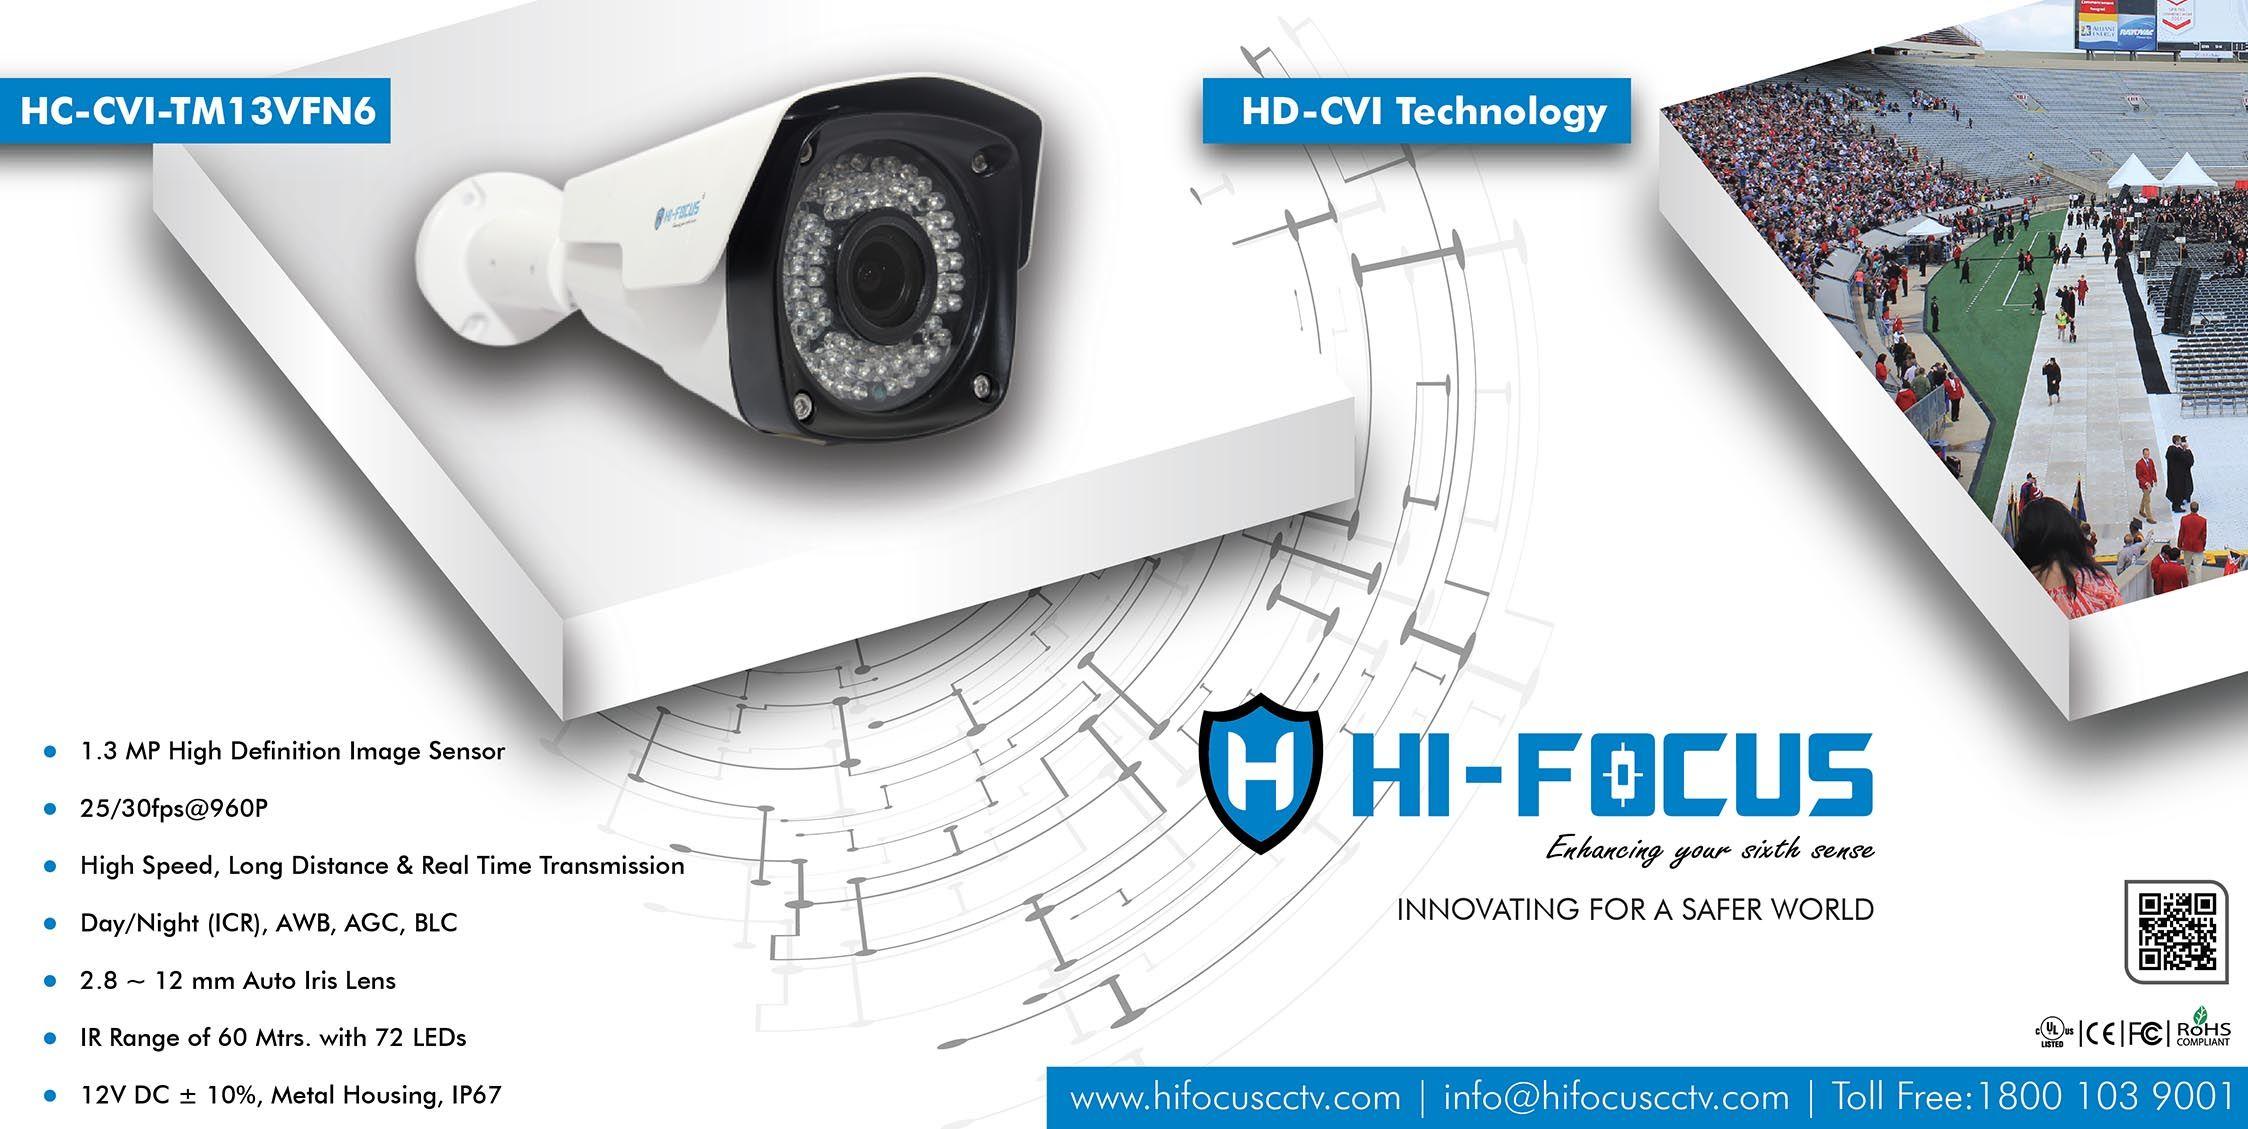 Hc Cvi Tm13vfn6 With Images Cvi Transmission Security System